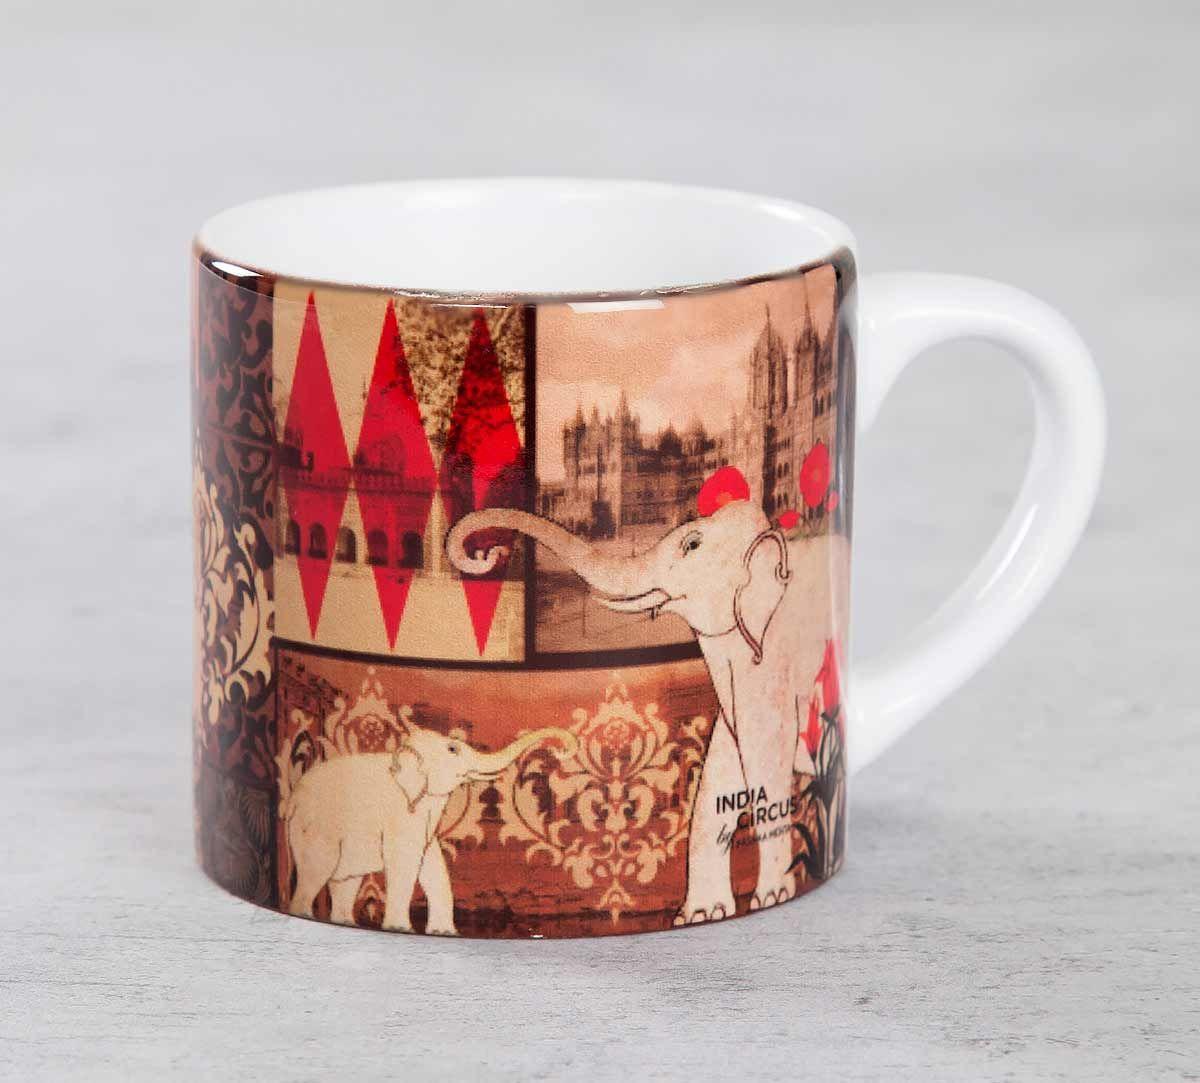 India Circus The Mughal Era Espresso Mug